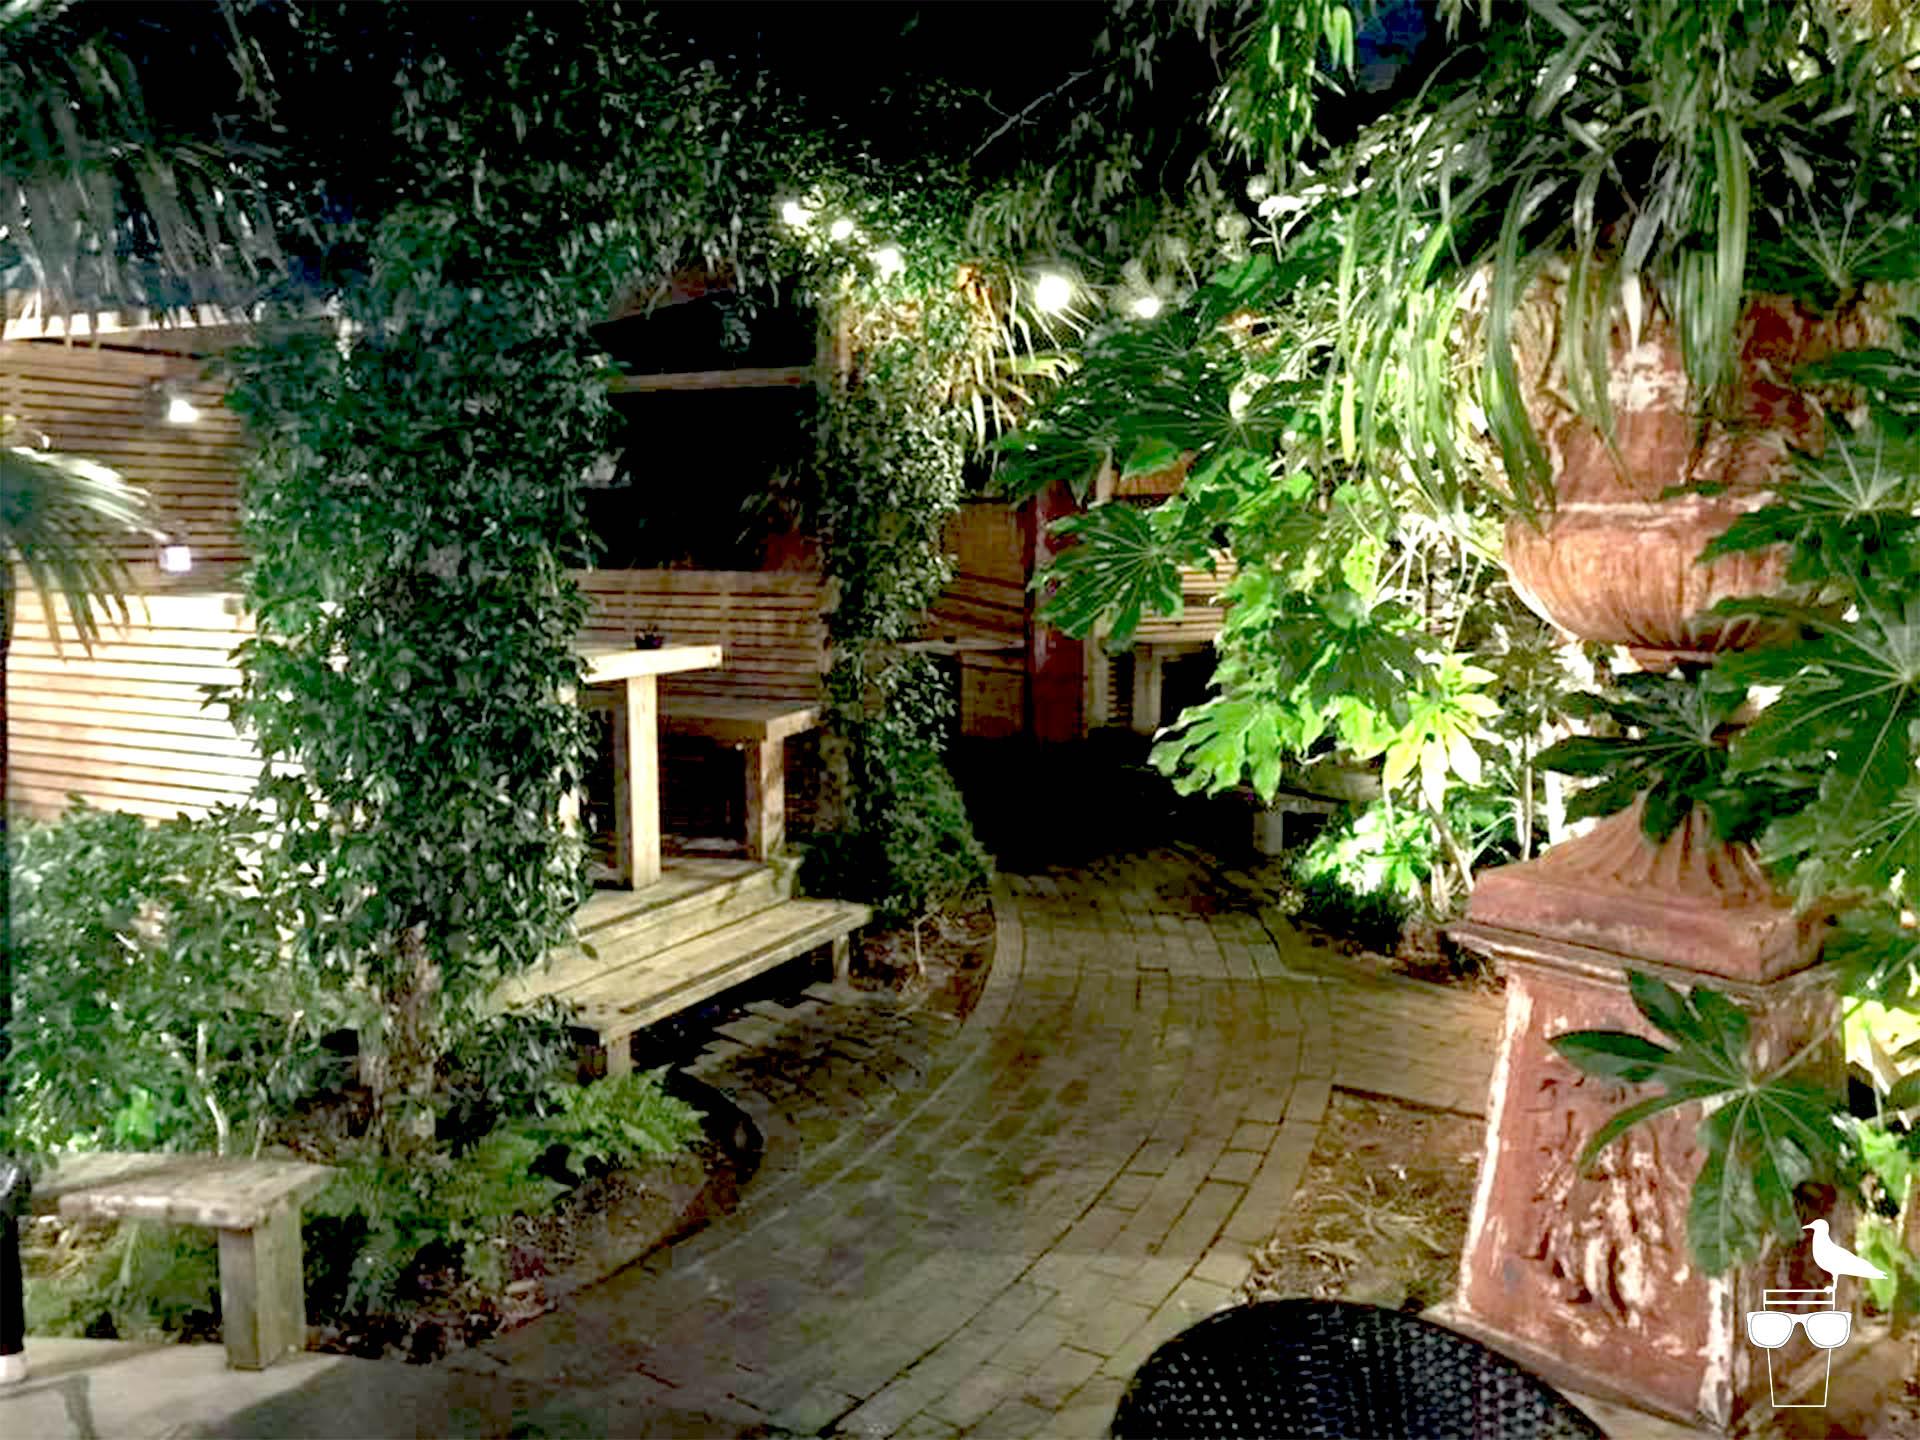 open house pub london road brighton garden pathway